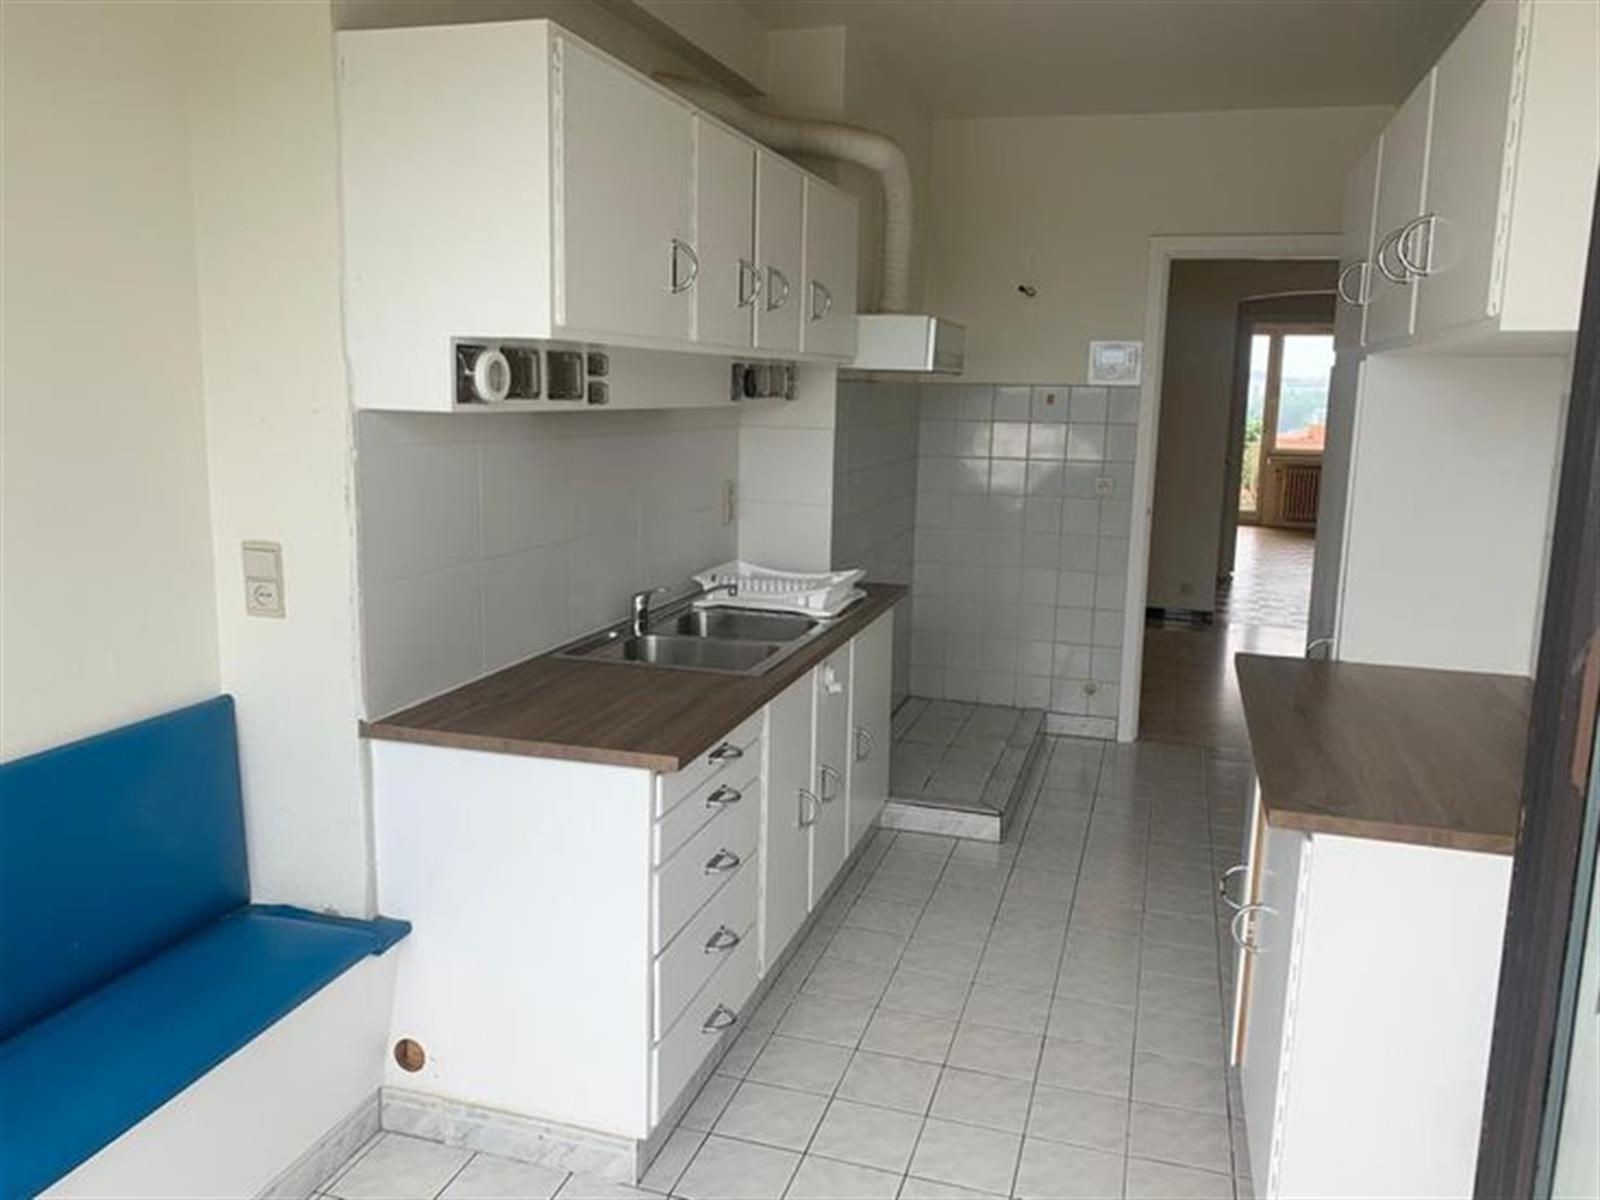 Appartement - Woluwe-Saint-Lambert - #4399349-2